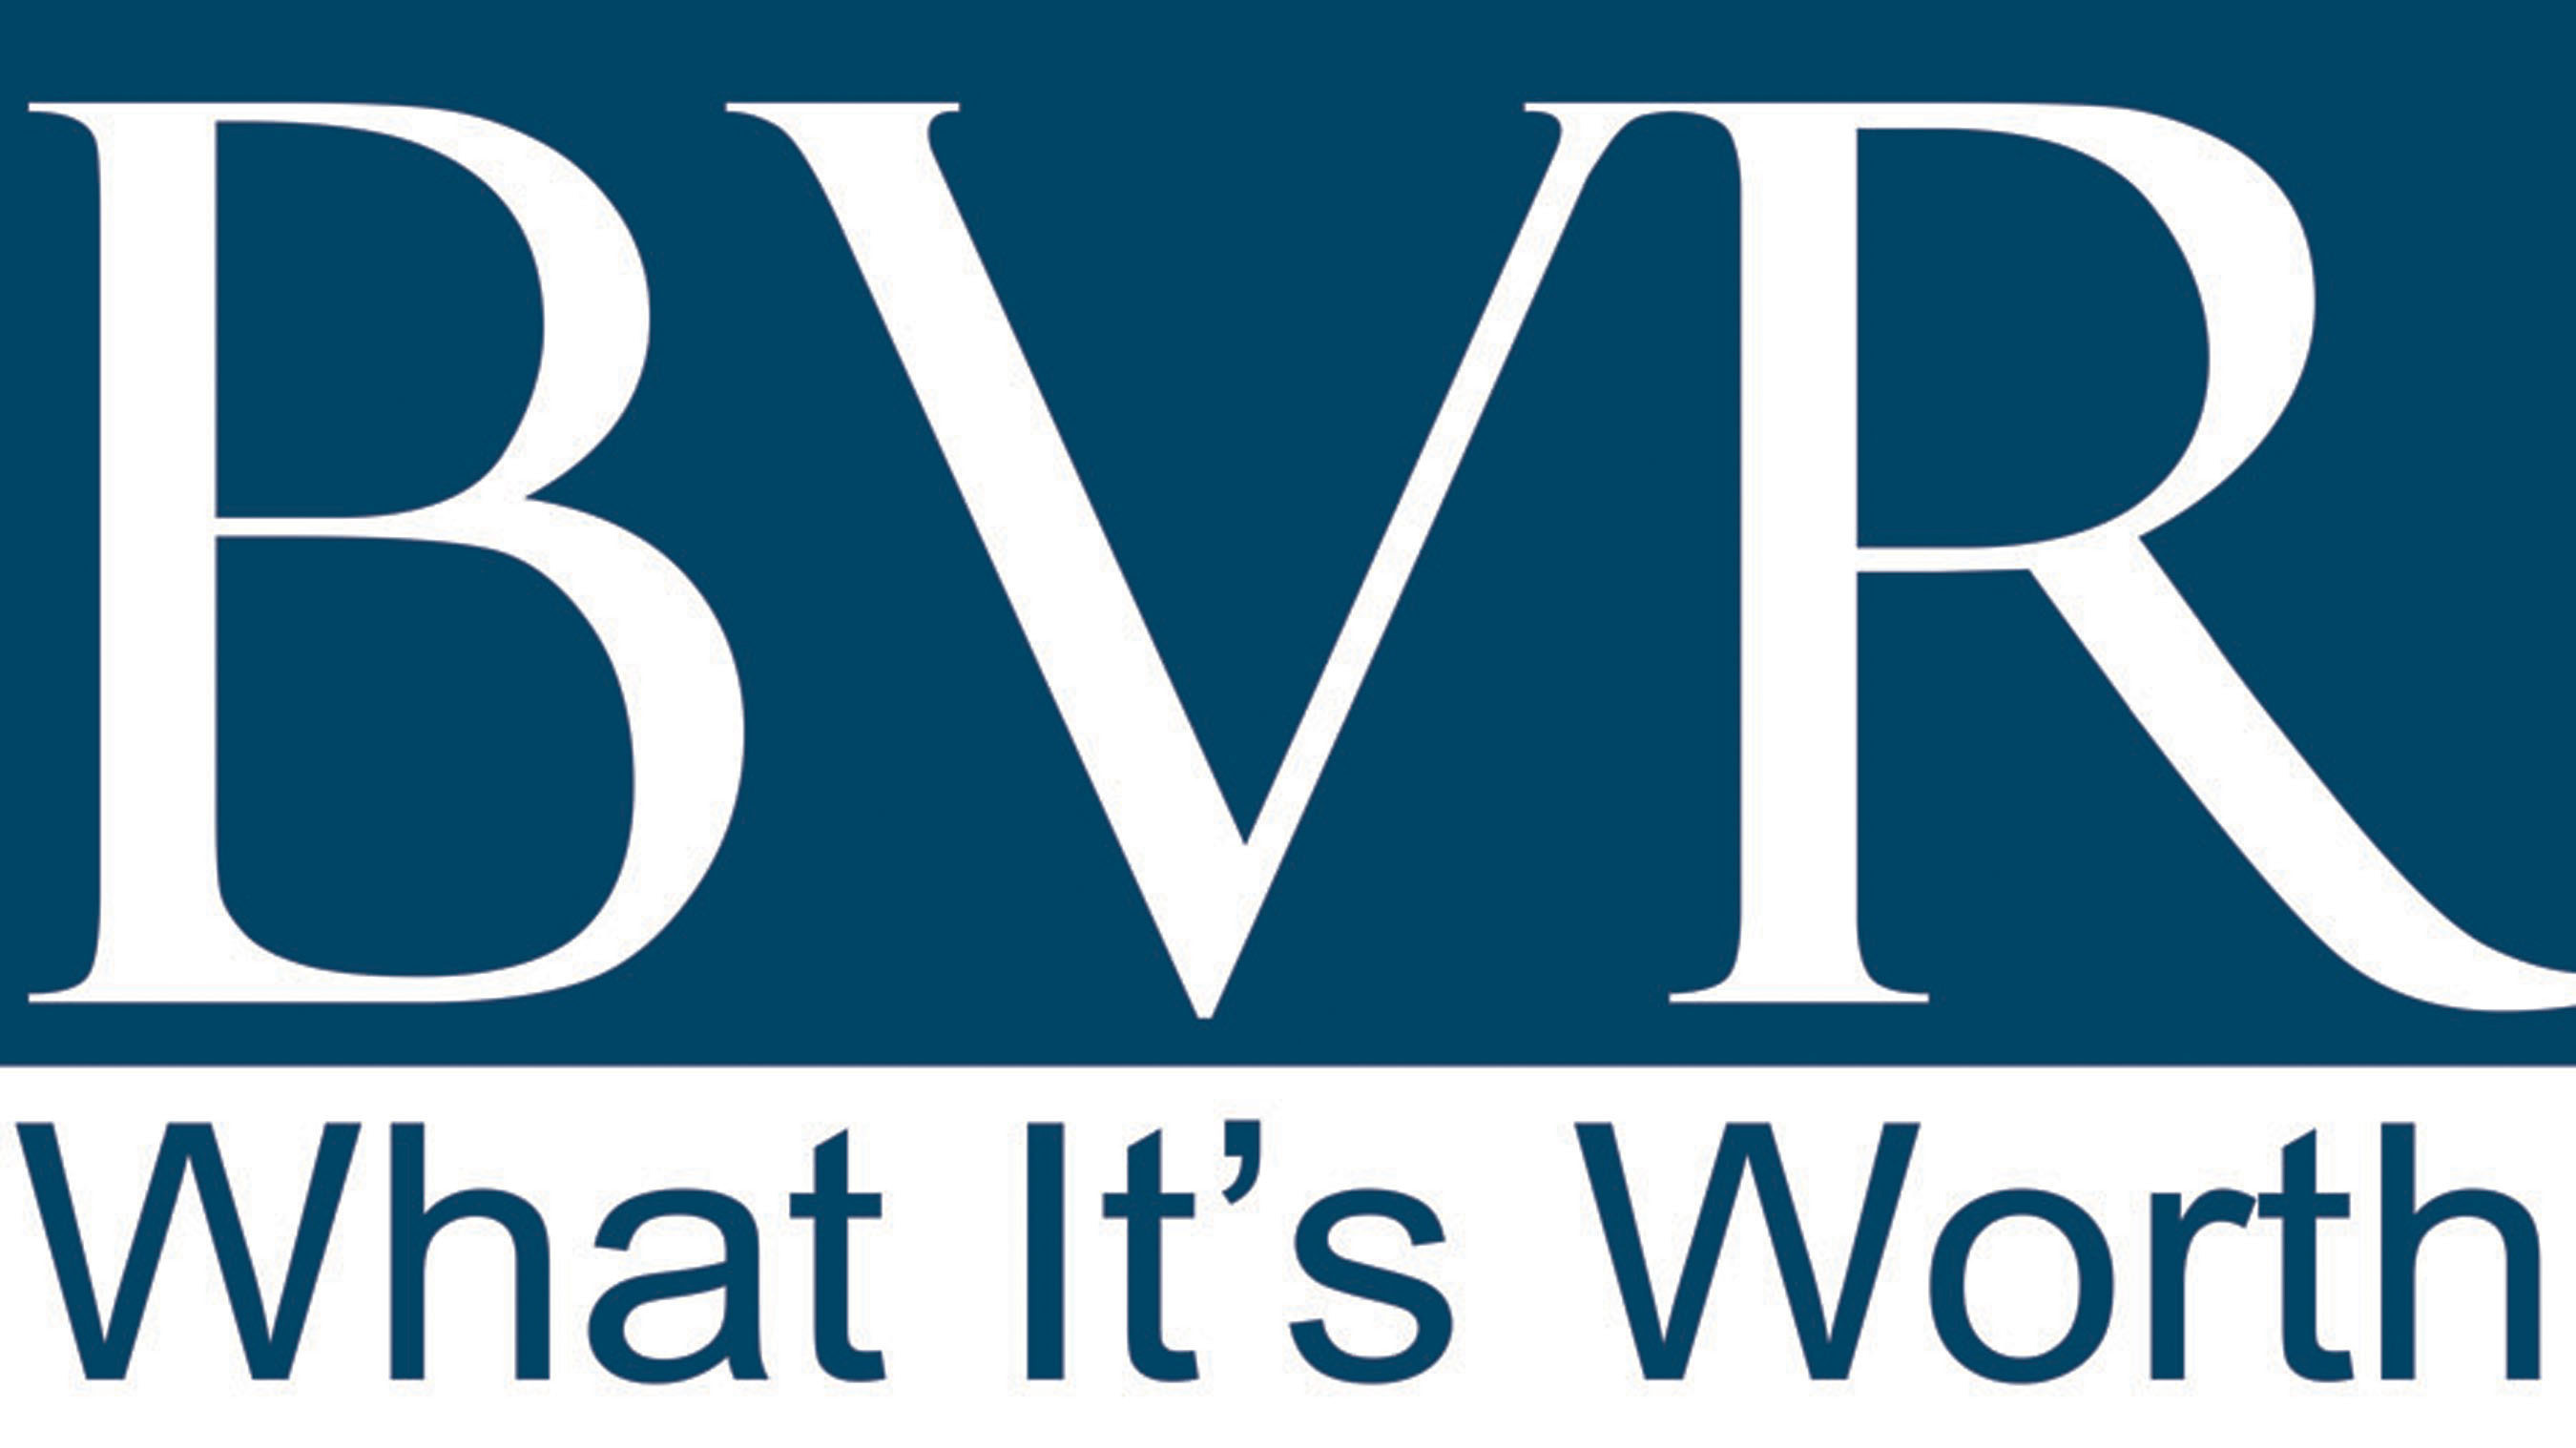 Business Valuation Resources, LLC - authoritative market data, continuing professional education, and expert opinion in the business valuation profession. (PRNewsFoto/Business Valuation Resources, LLC) (PRNewsFoto/)